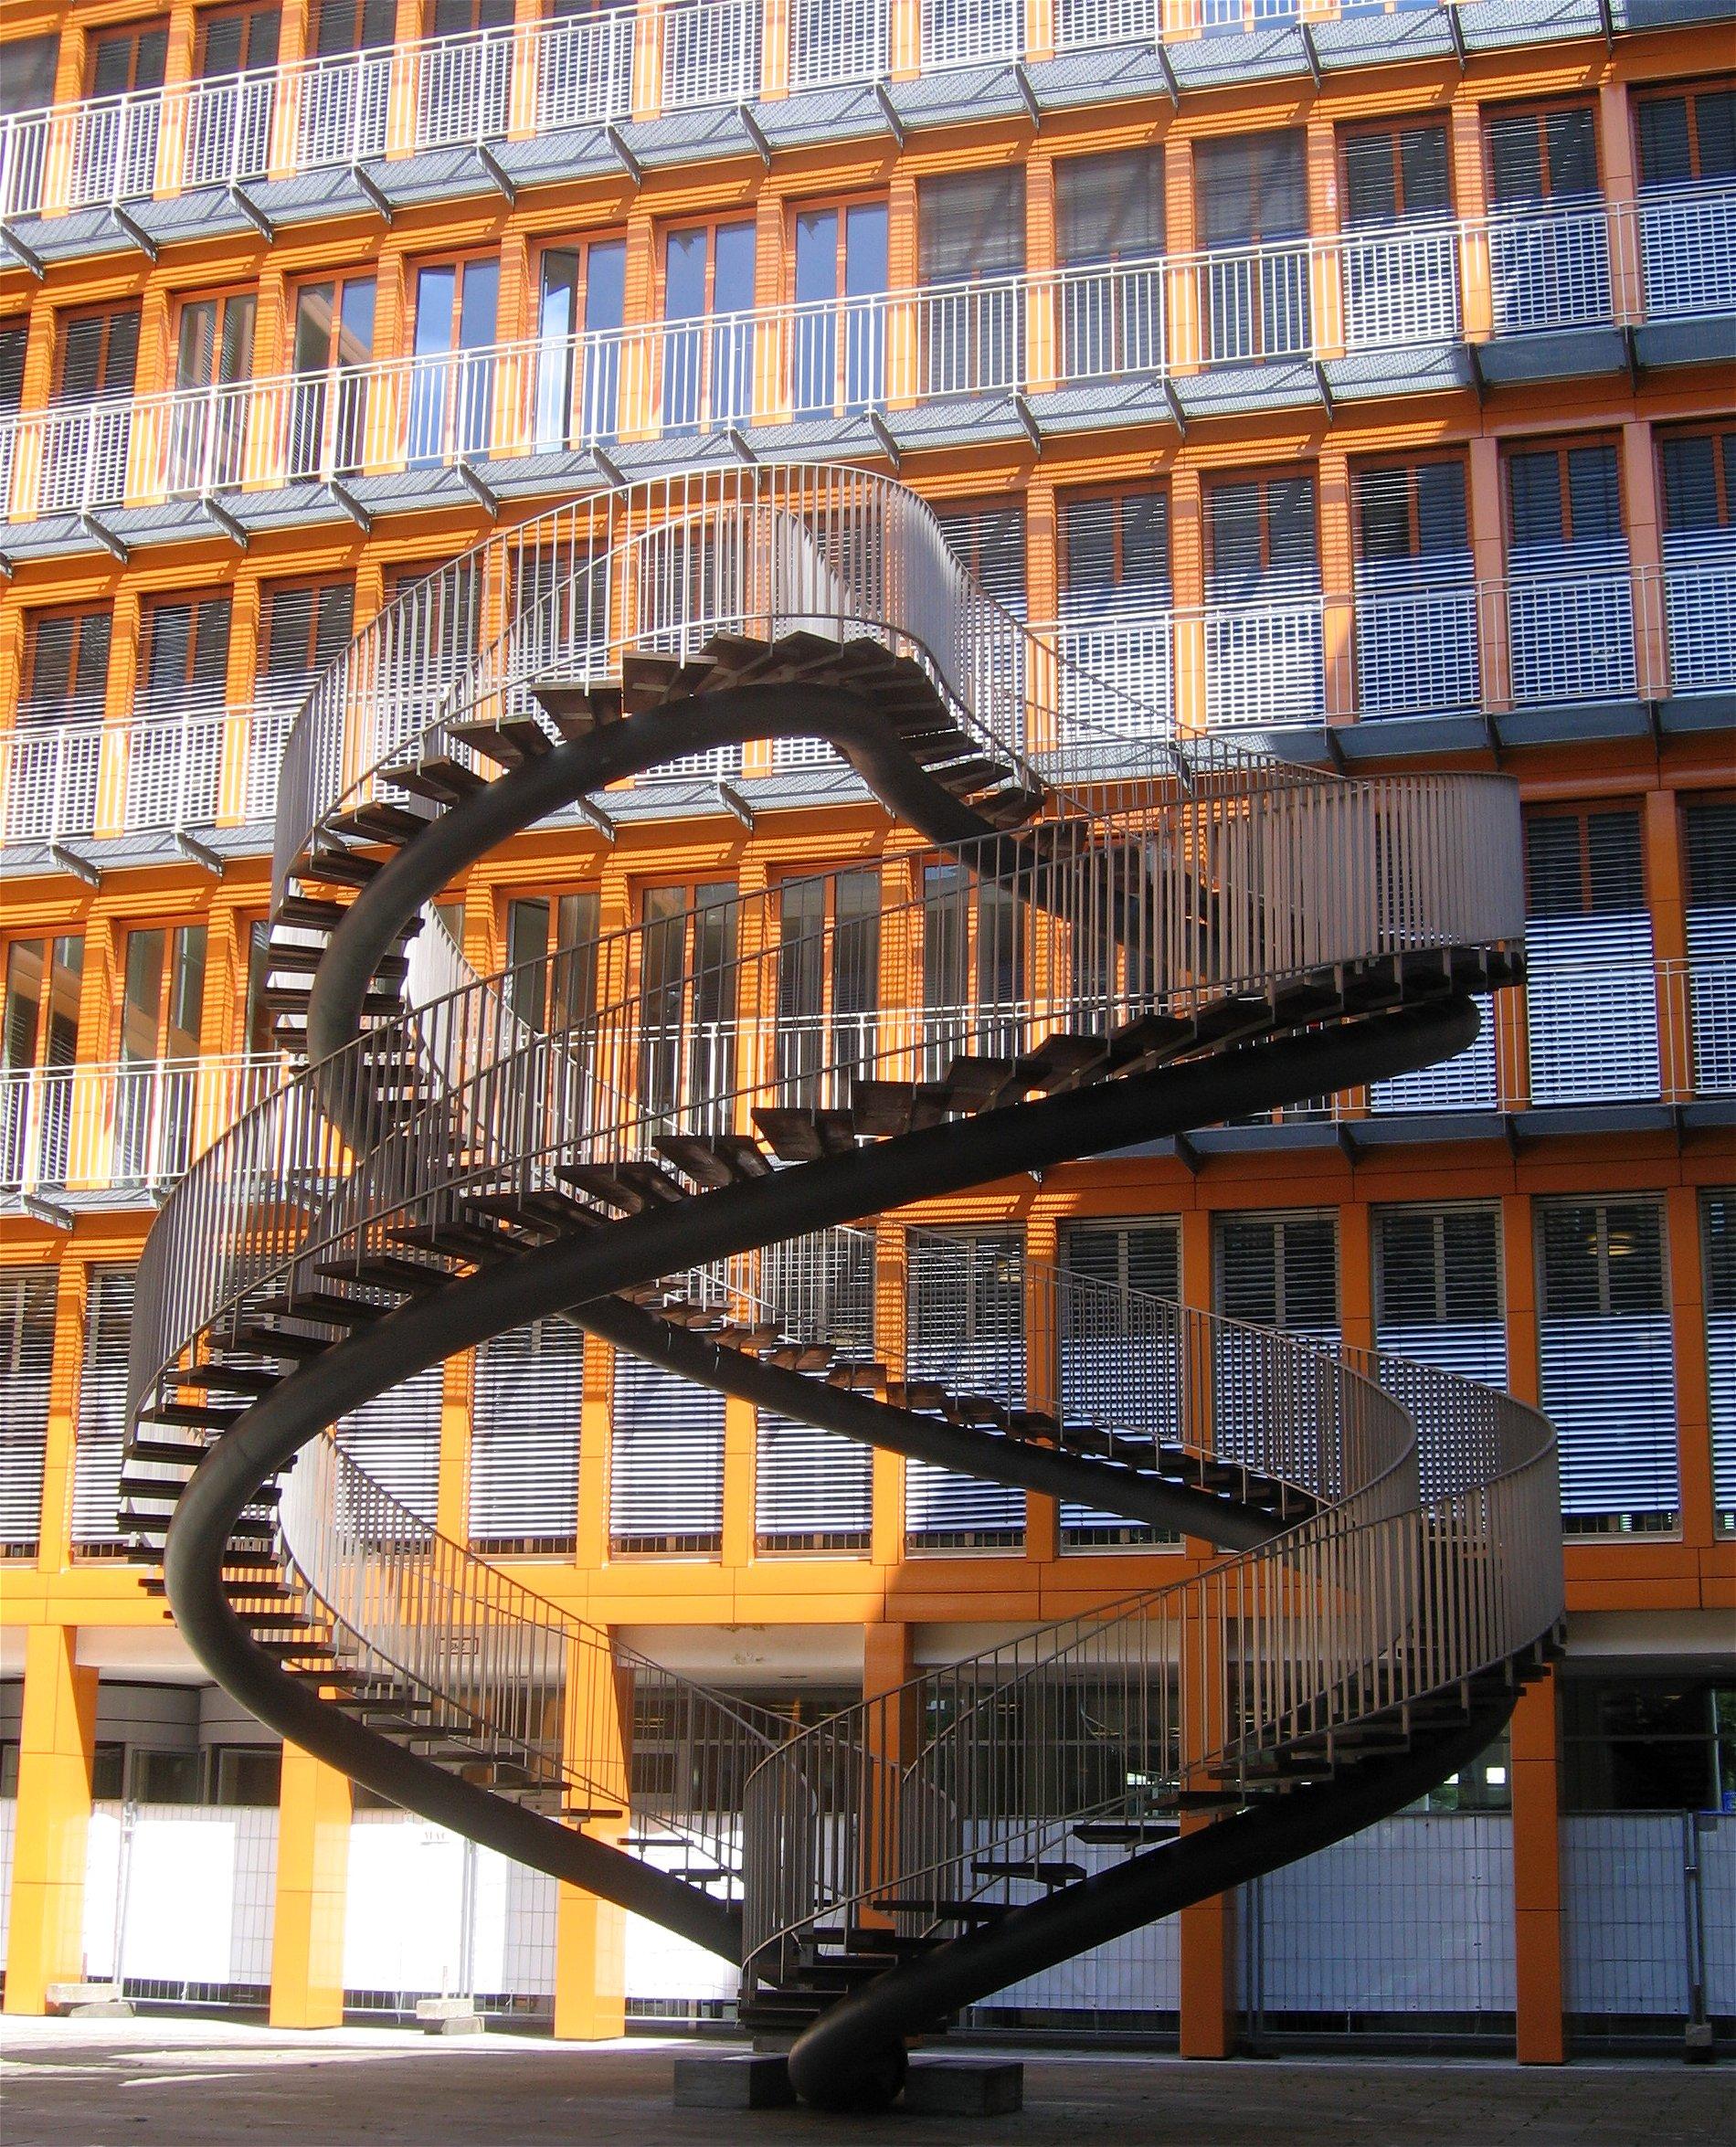 Treppen München file olafur eliasson umschreibung endlose treppe 2004 kpmg zentrale